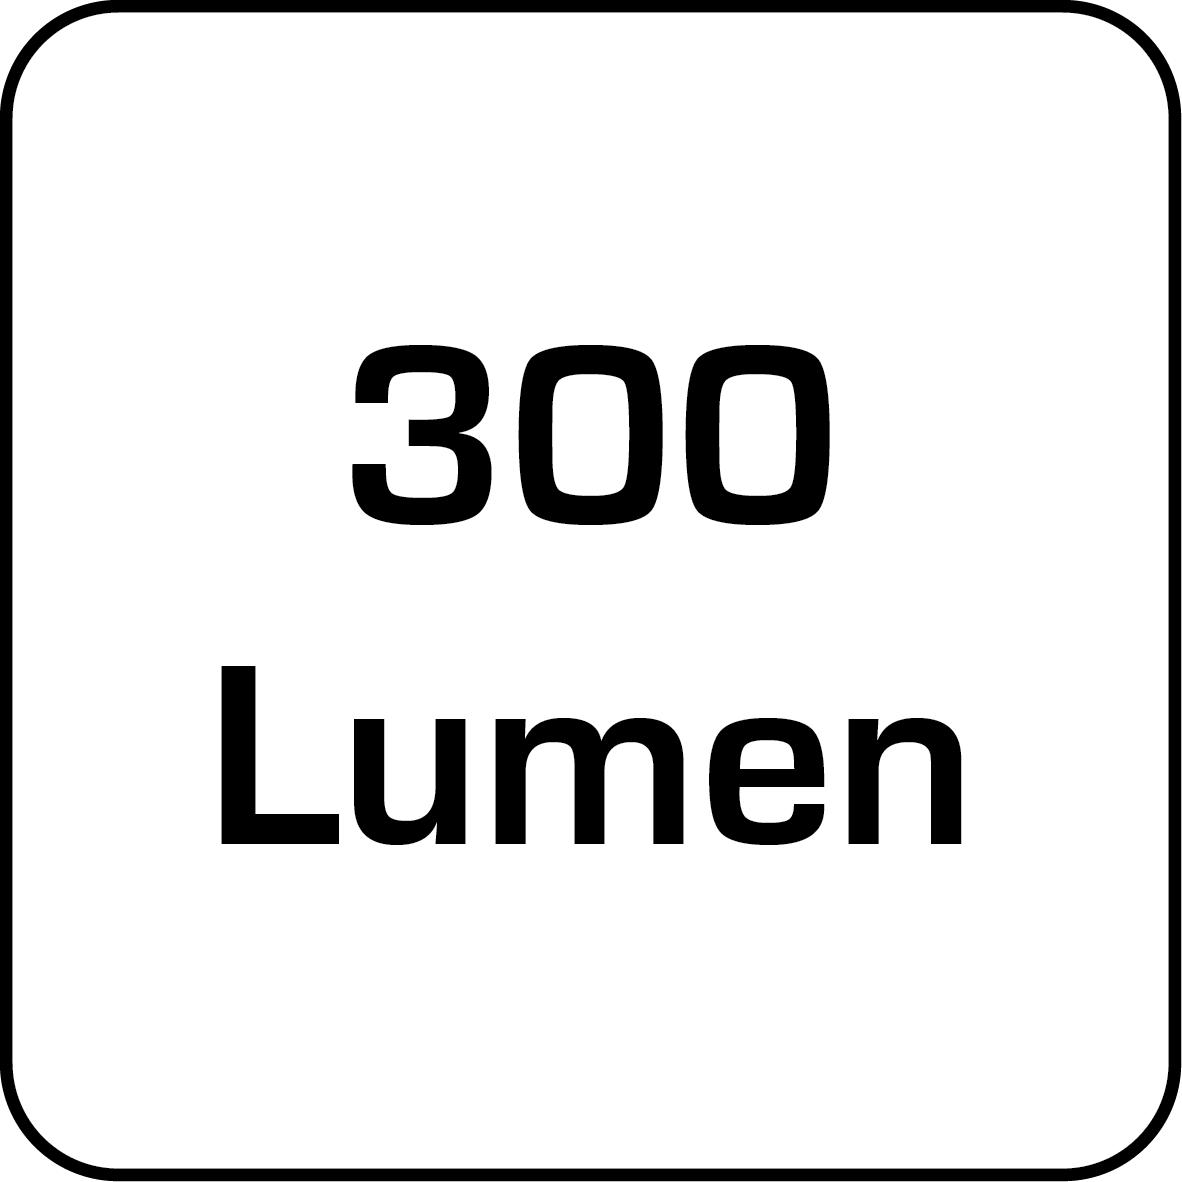 11-300-lumen